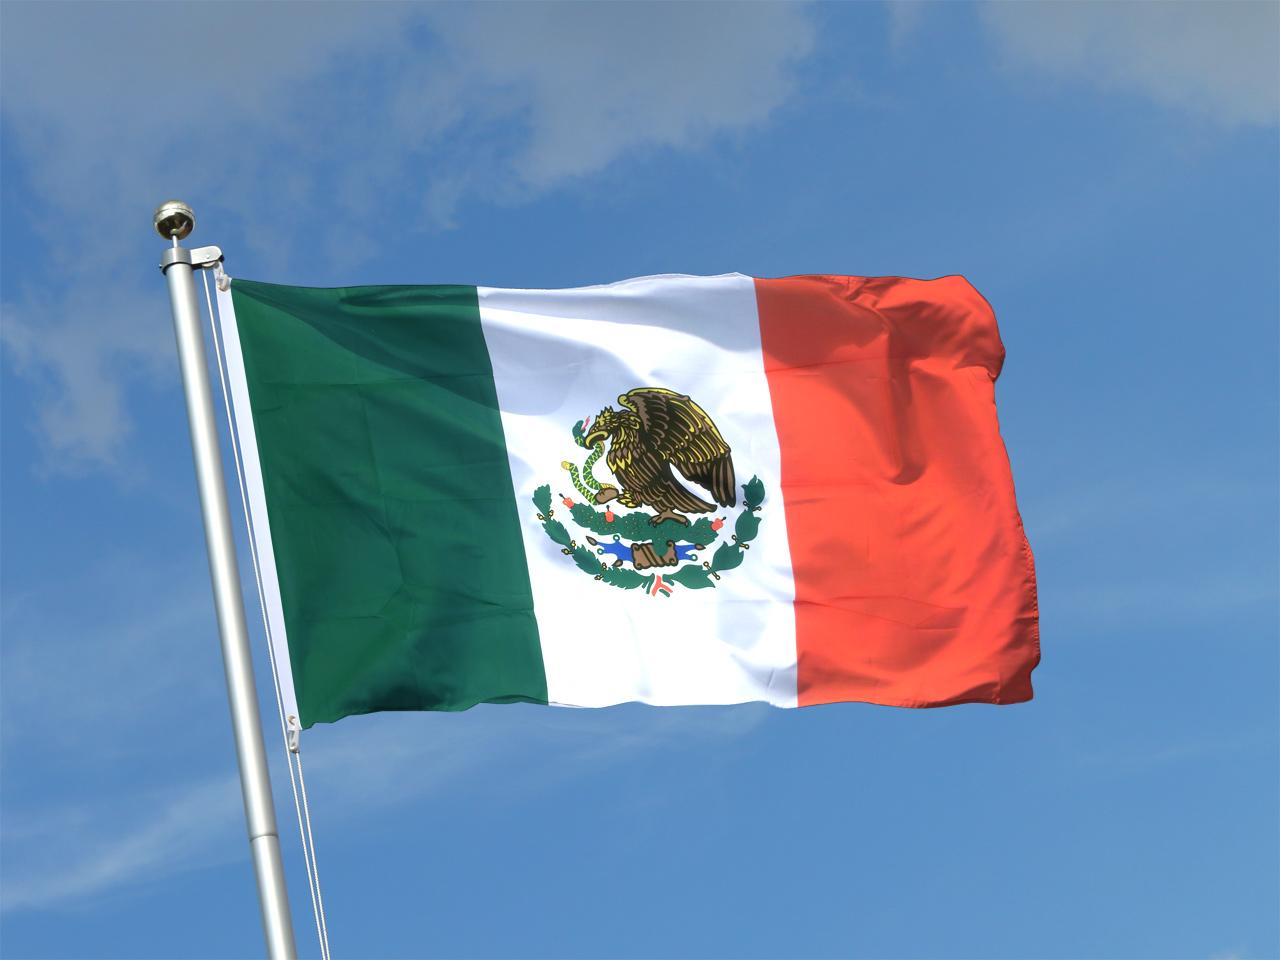 buy mexico flag 3x5 ft 90x150 cm royal flags